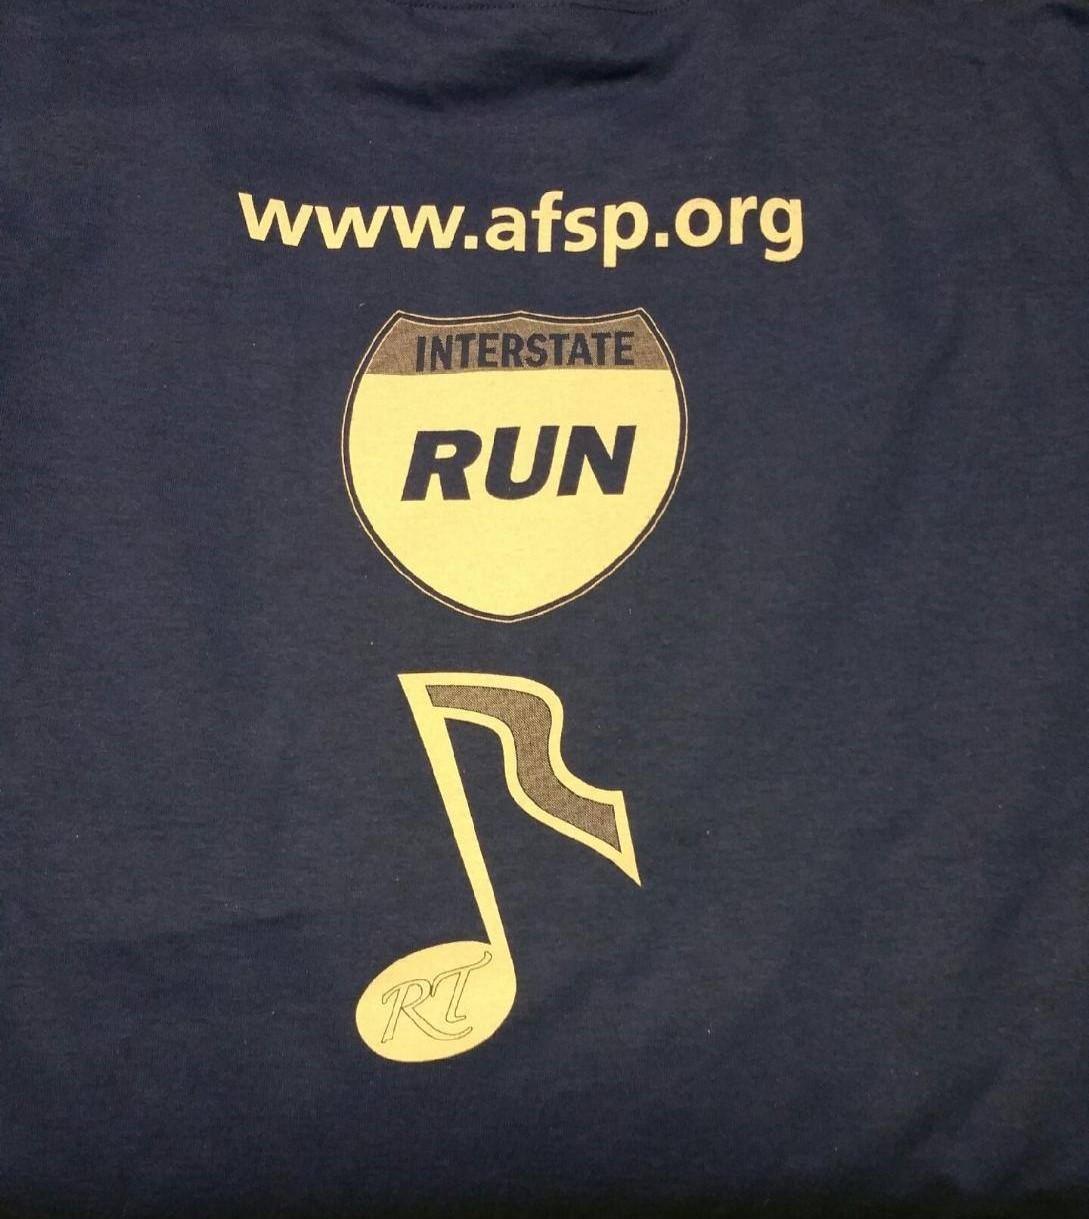 afsp-interstaate-run